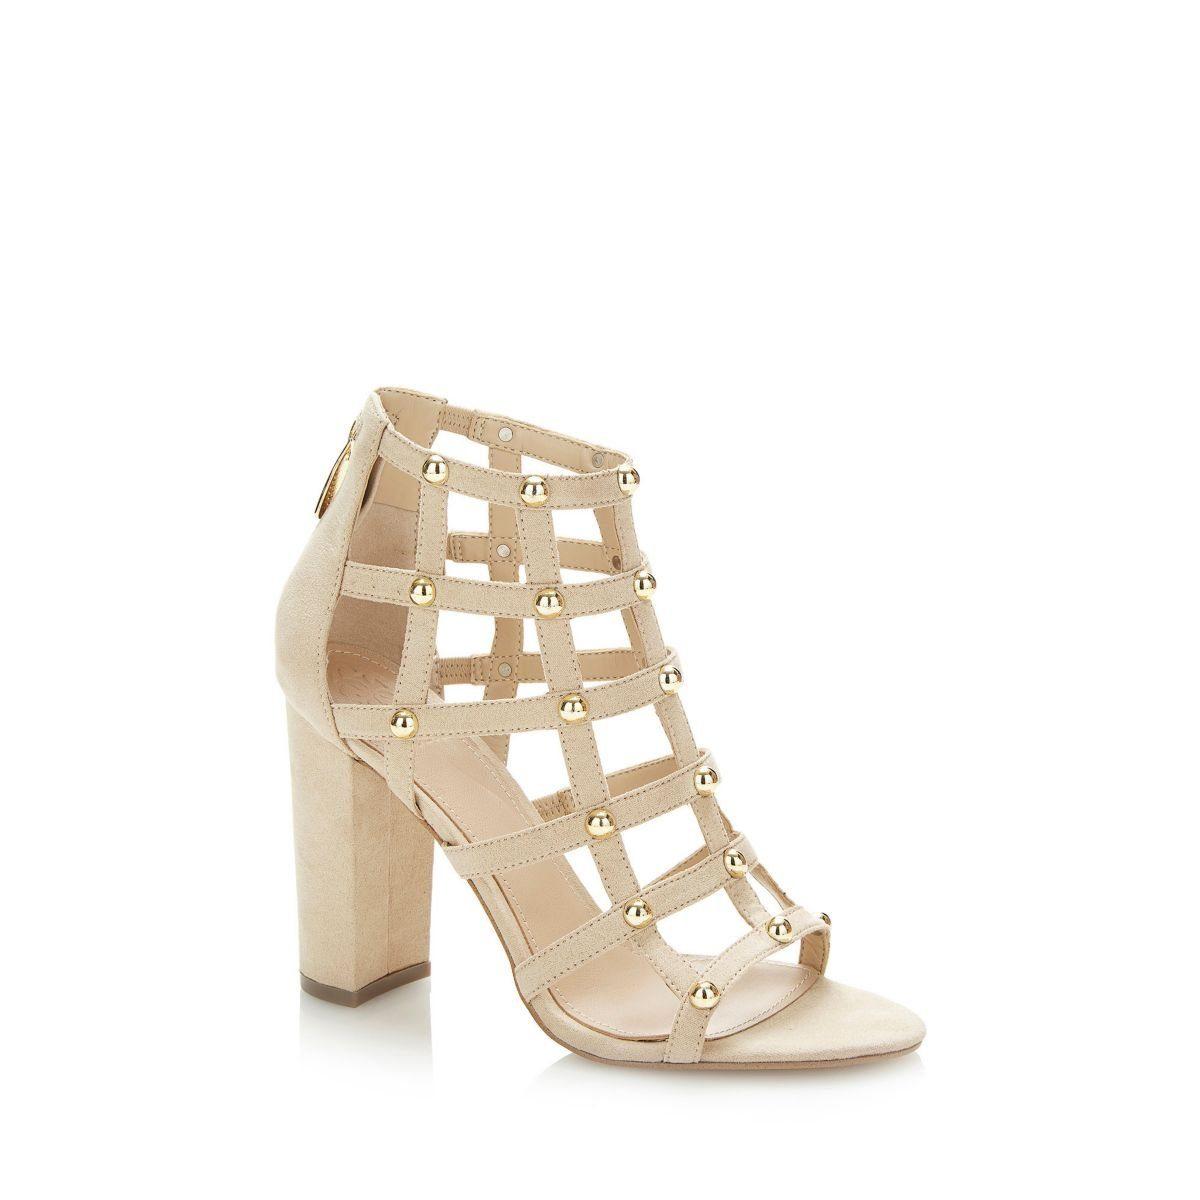 Guess Sandale online kaufen  beige